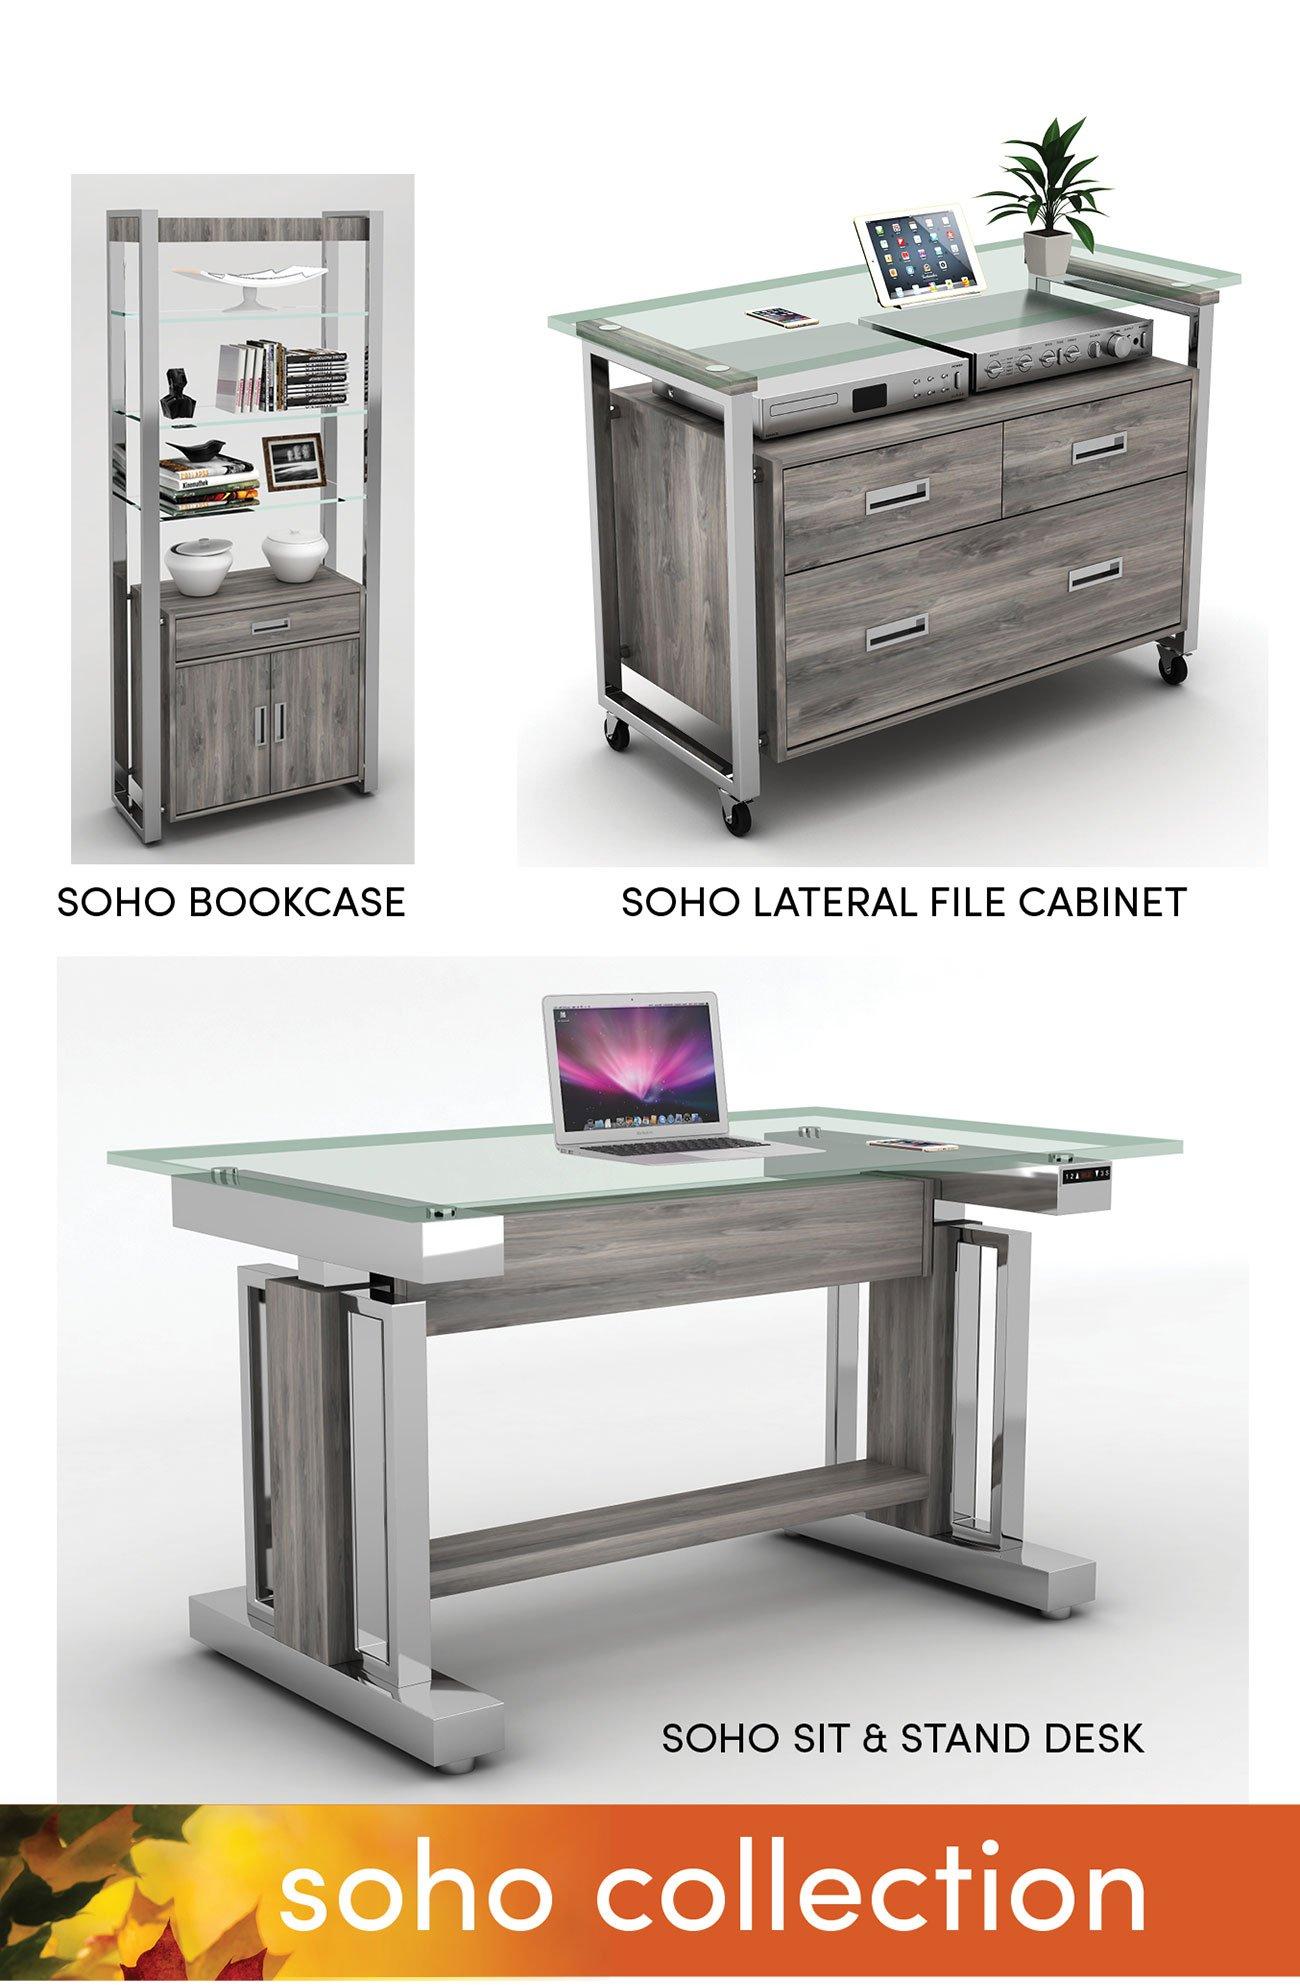 Soho-collection